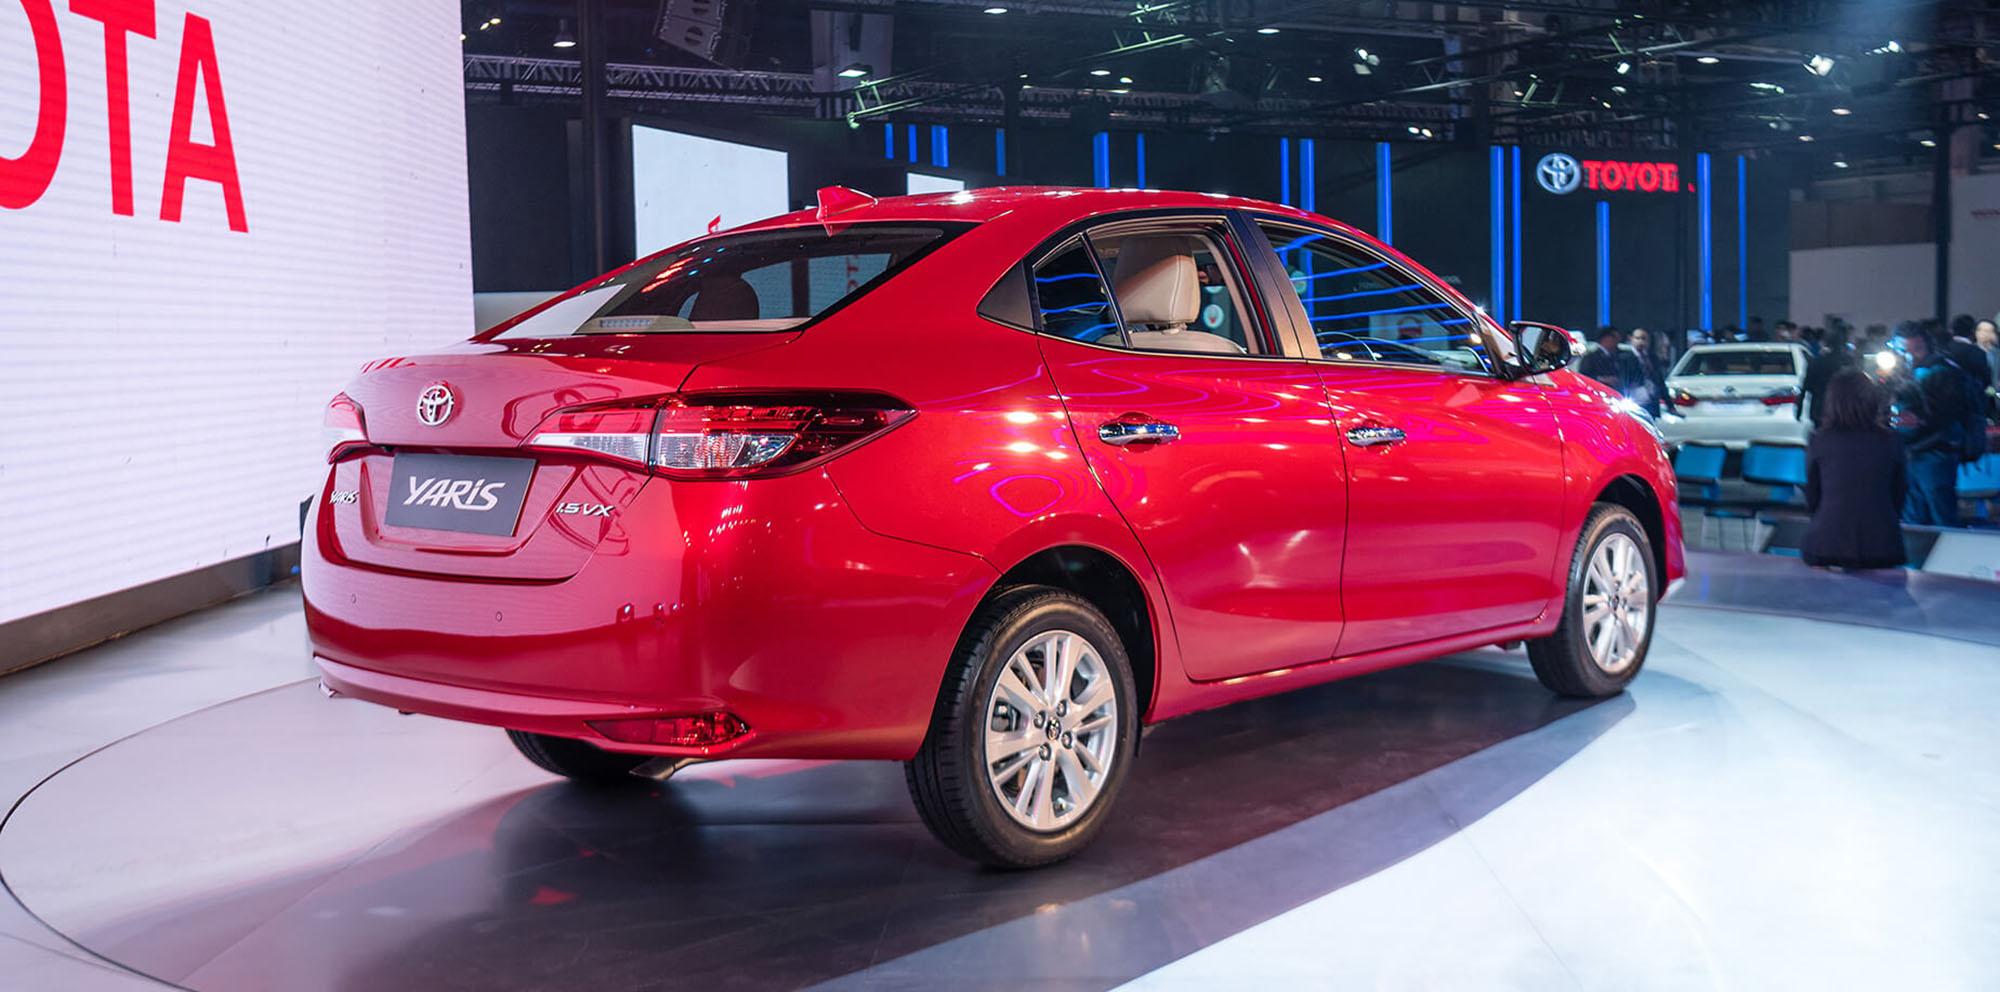 Toyota Cars India